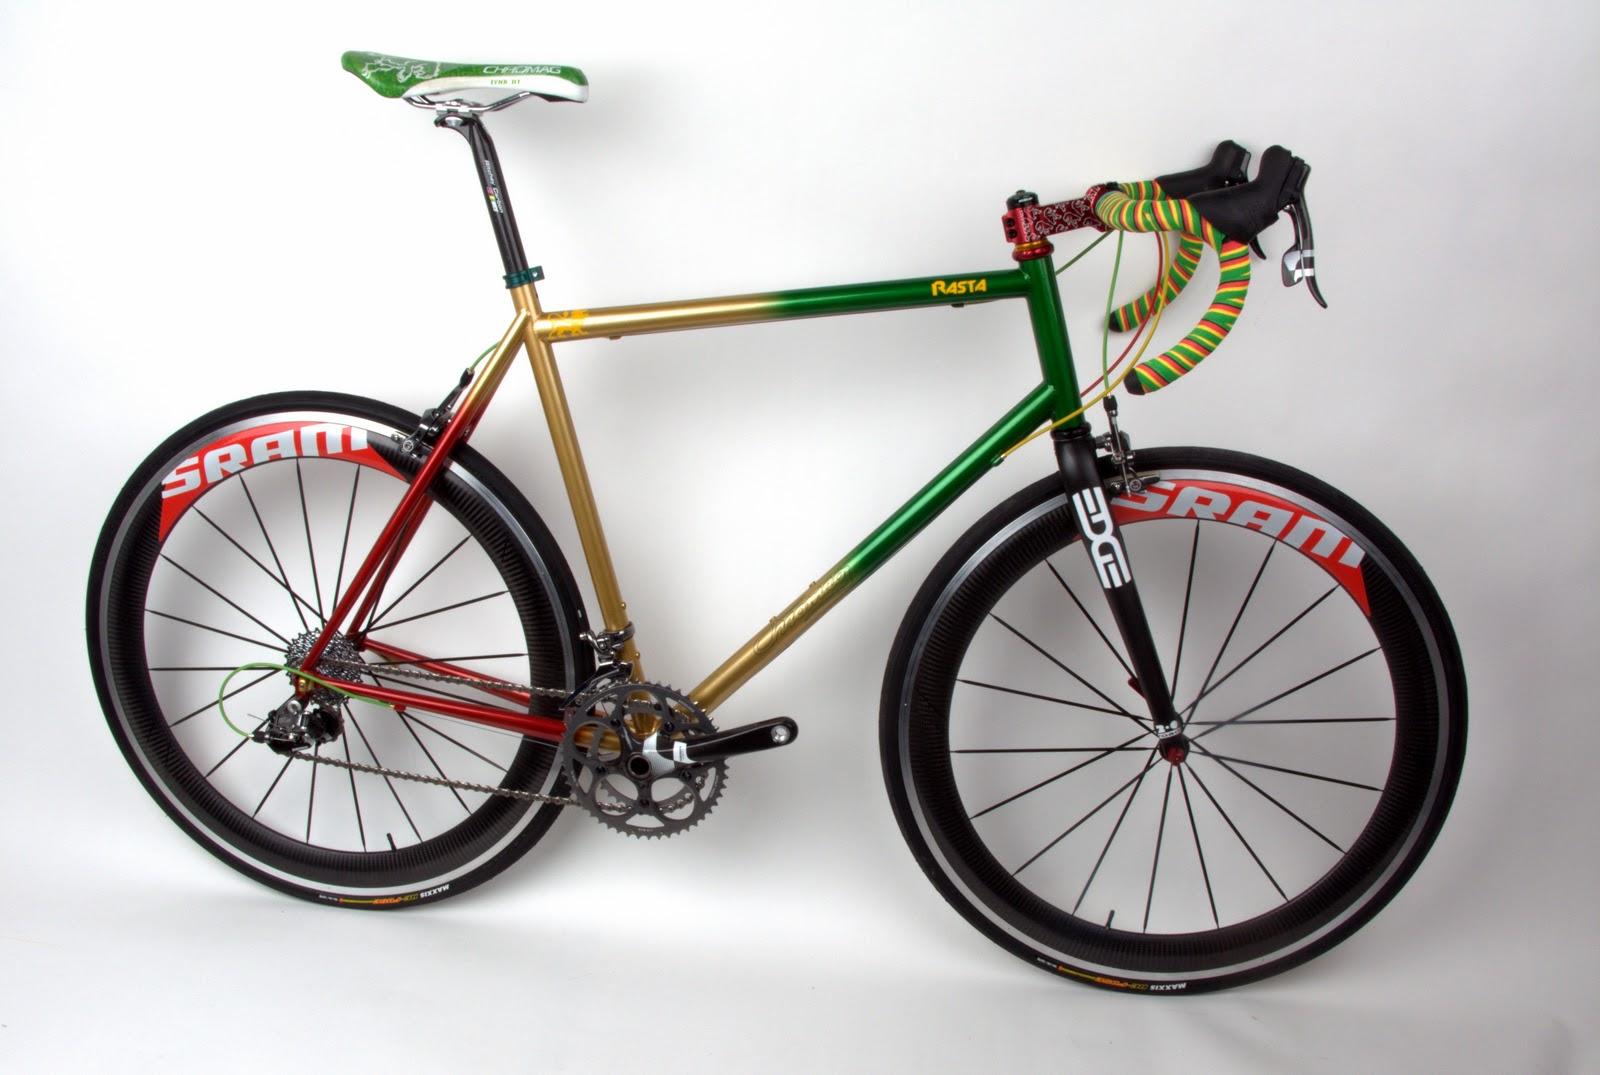 Chromag road bike!!! - NSMB.com Forums 3bd75f6ac